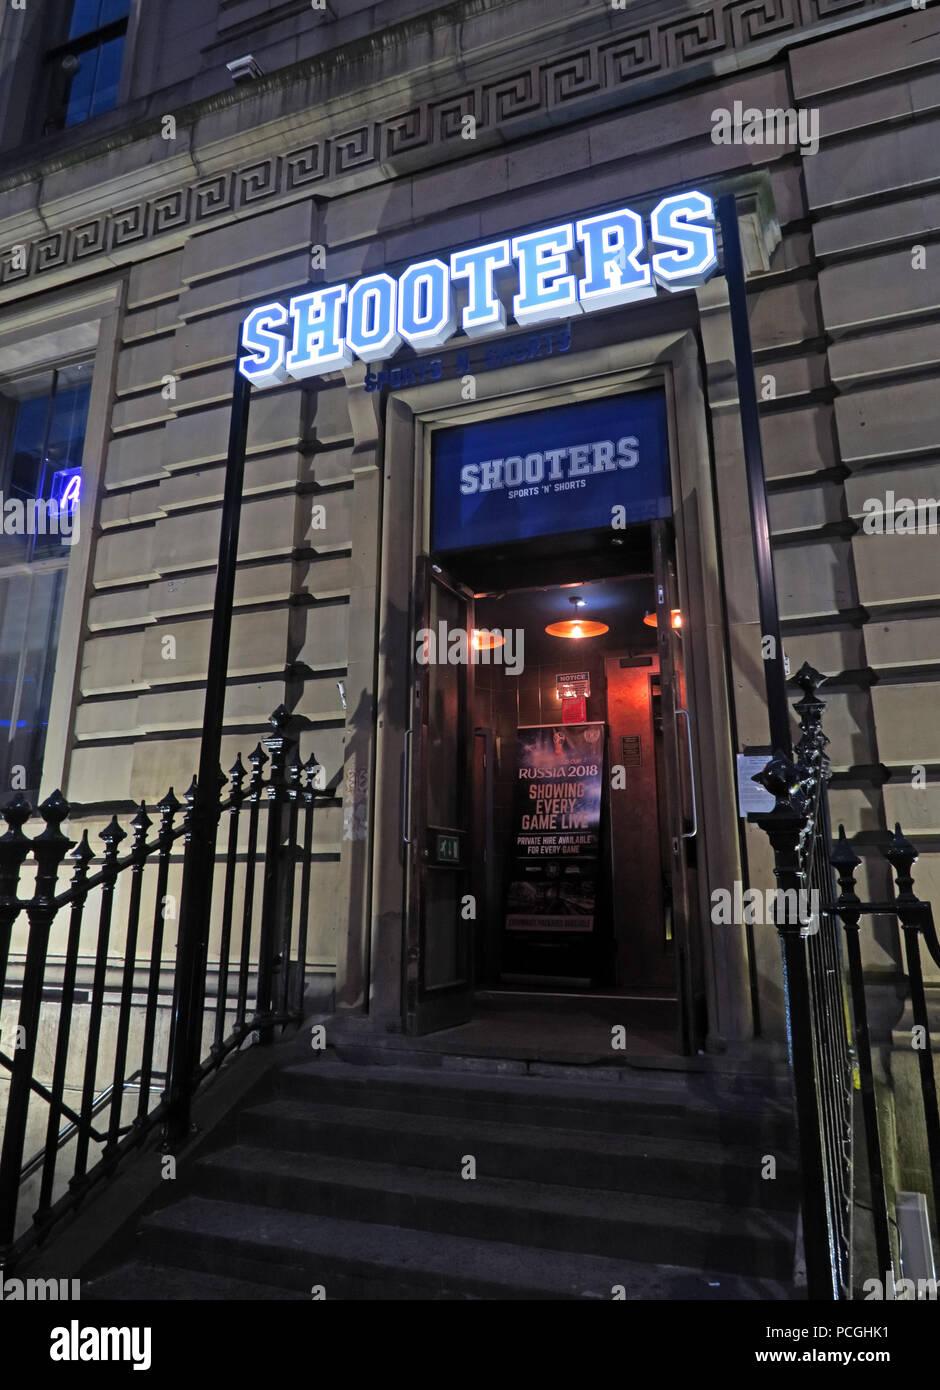 Shooters bar, The Headrow, Leeds city centre, West Yorkshire, England, LS1, UK Stock Photo